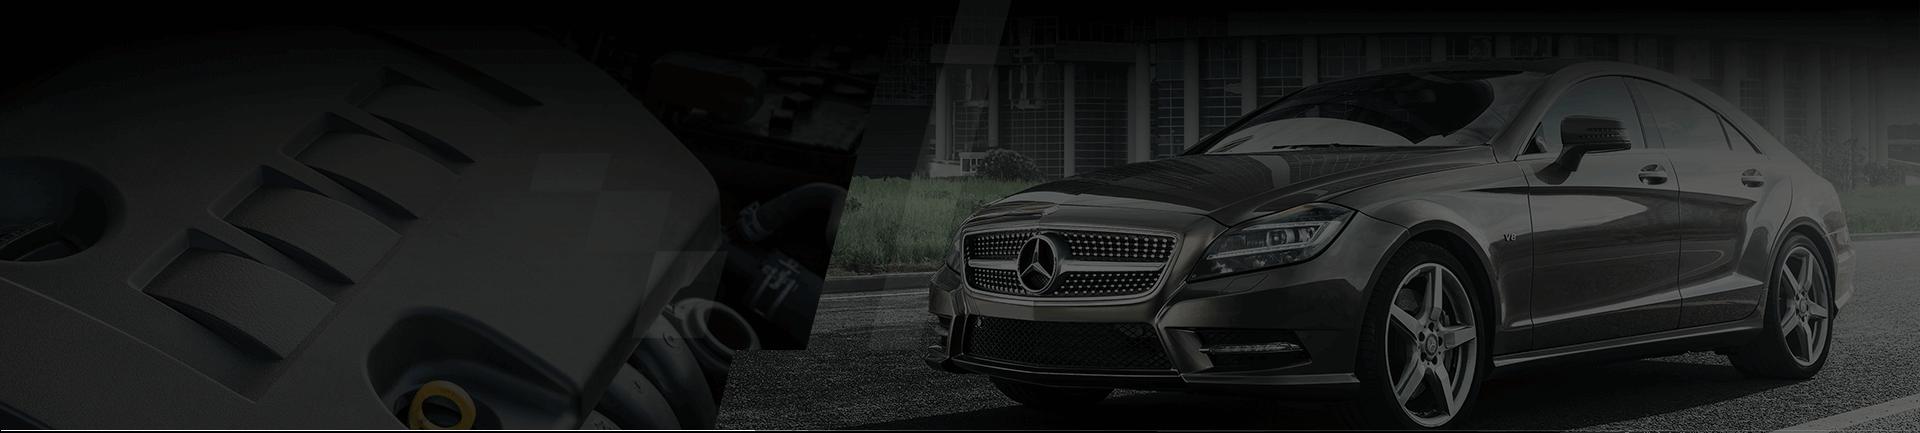 Benz Banner (1)